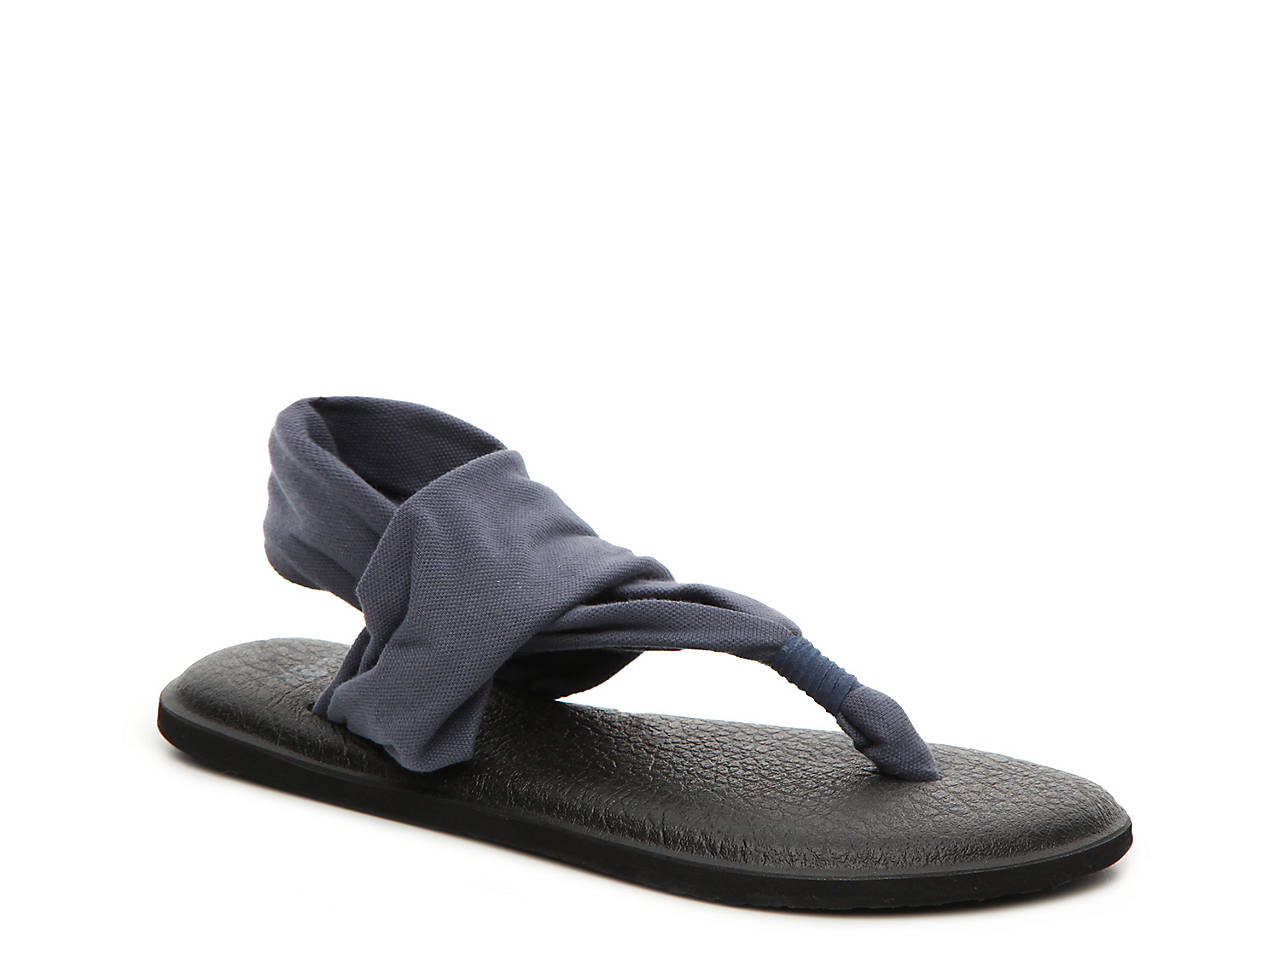 Women's sandals that hide bunions - Yoga Sling Flat Sandal